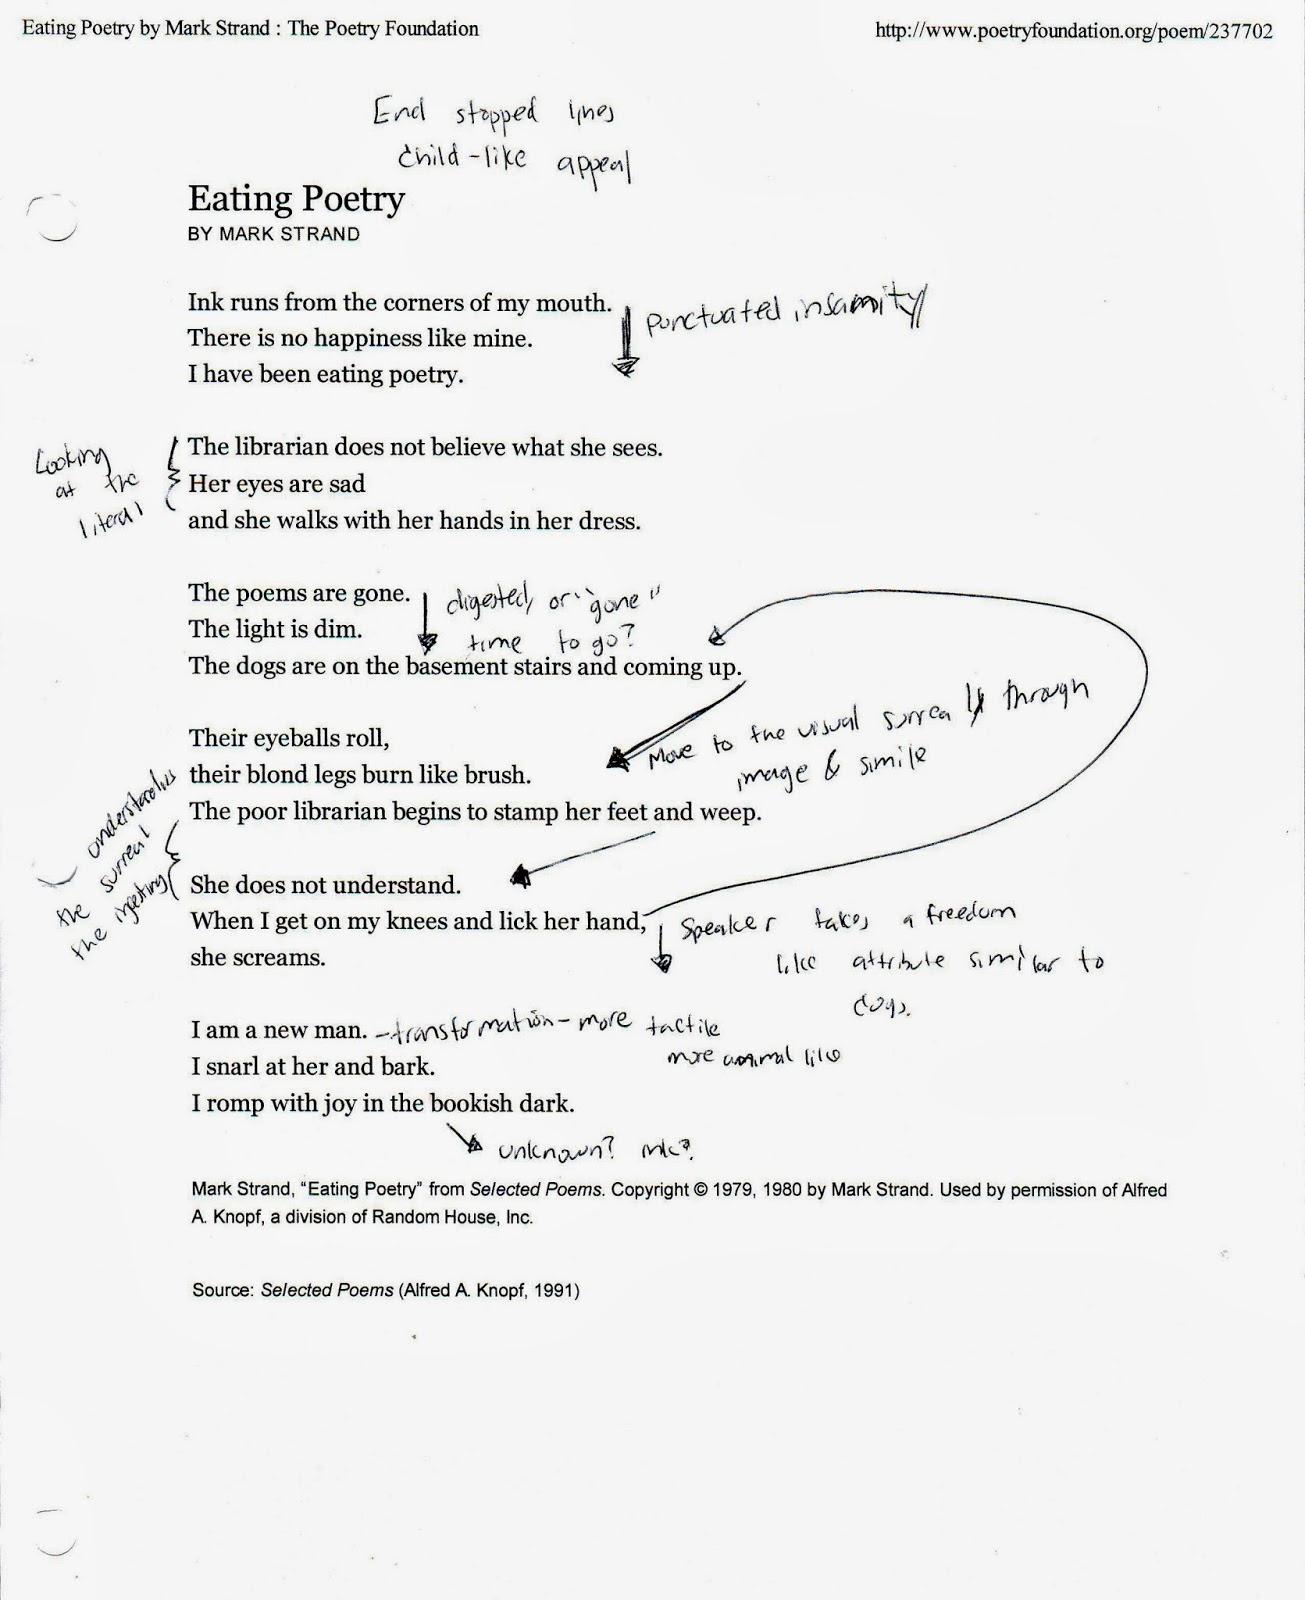 Sonnet 130 analysis essay